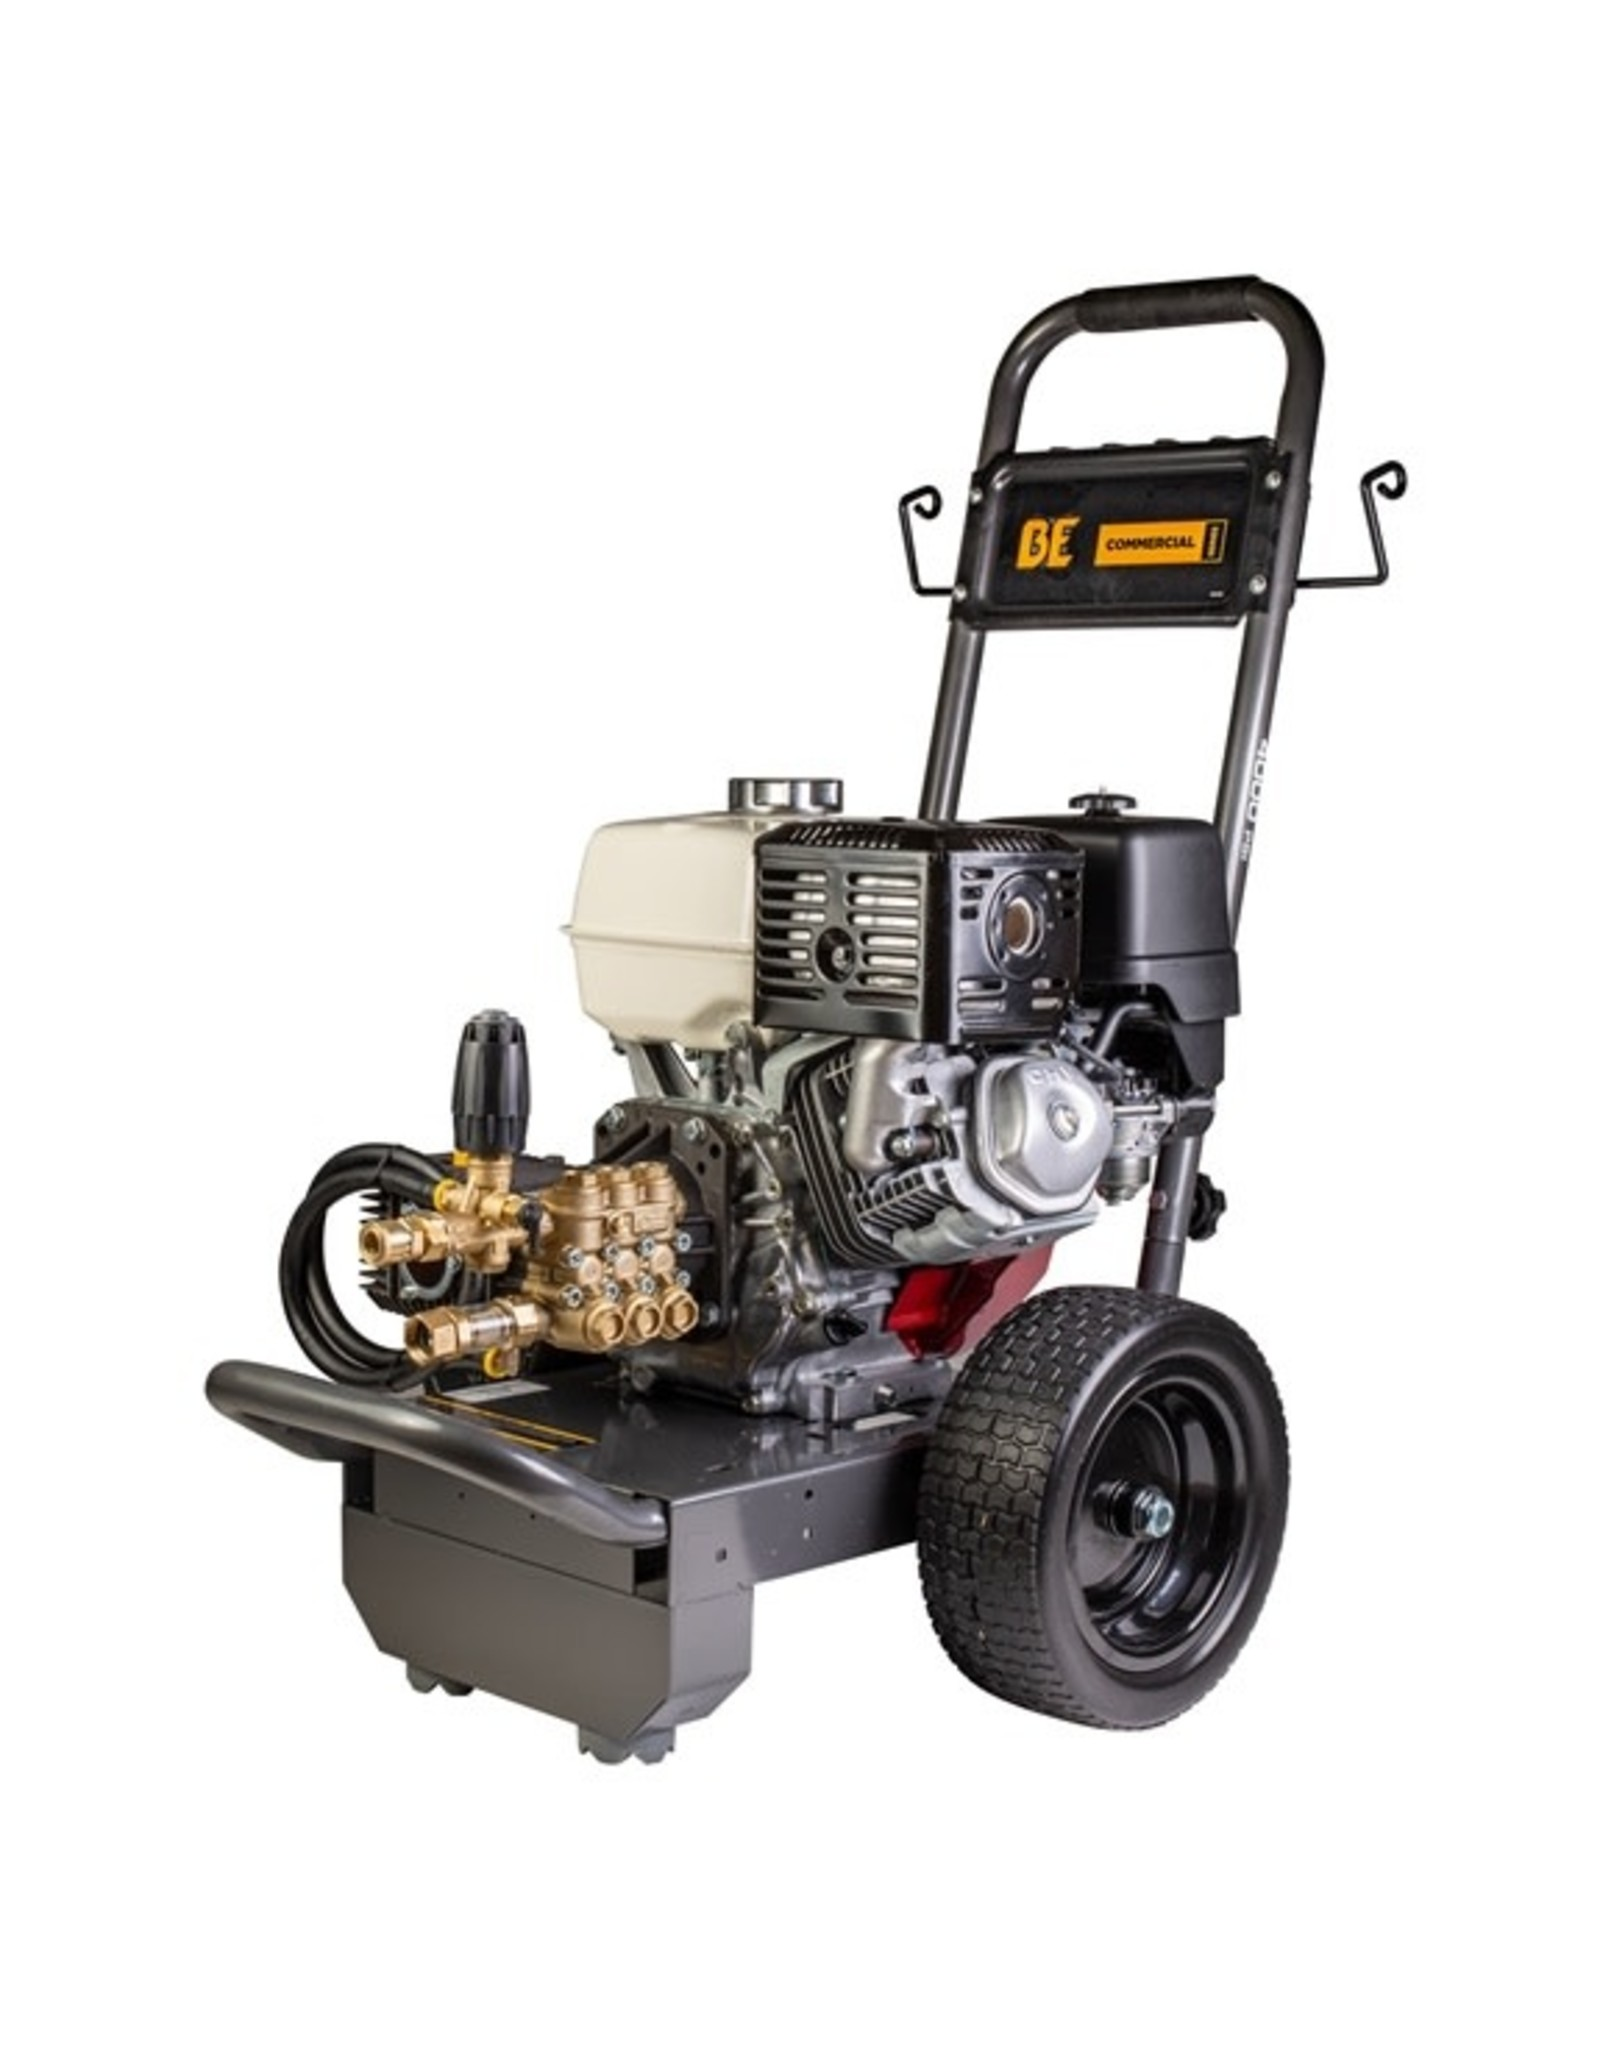 BE B4013HCS 389cc 4000 PSI Pressure Washer